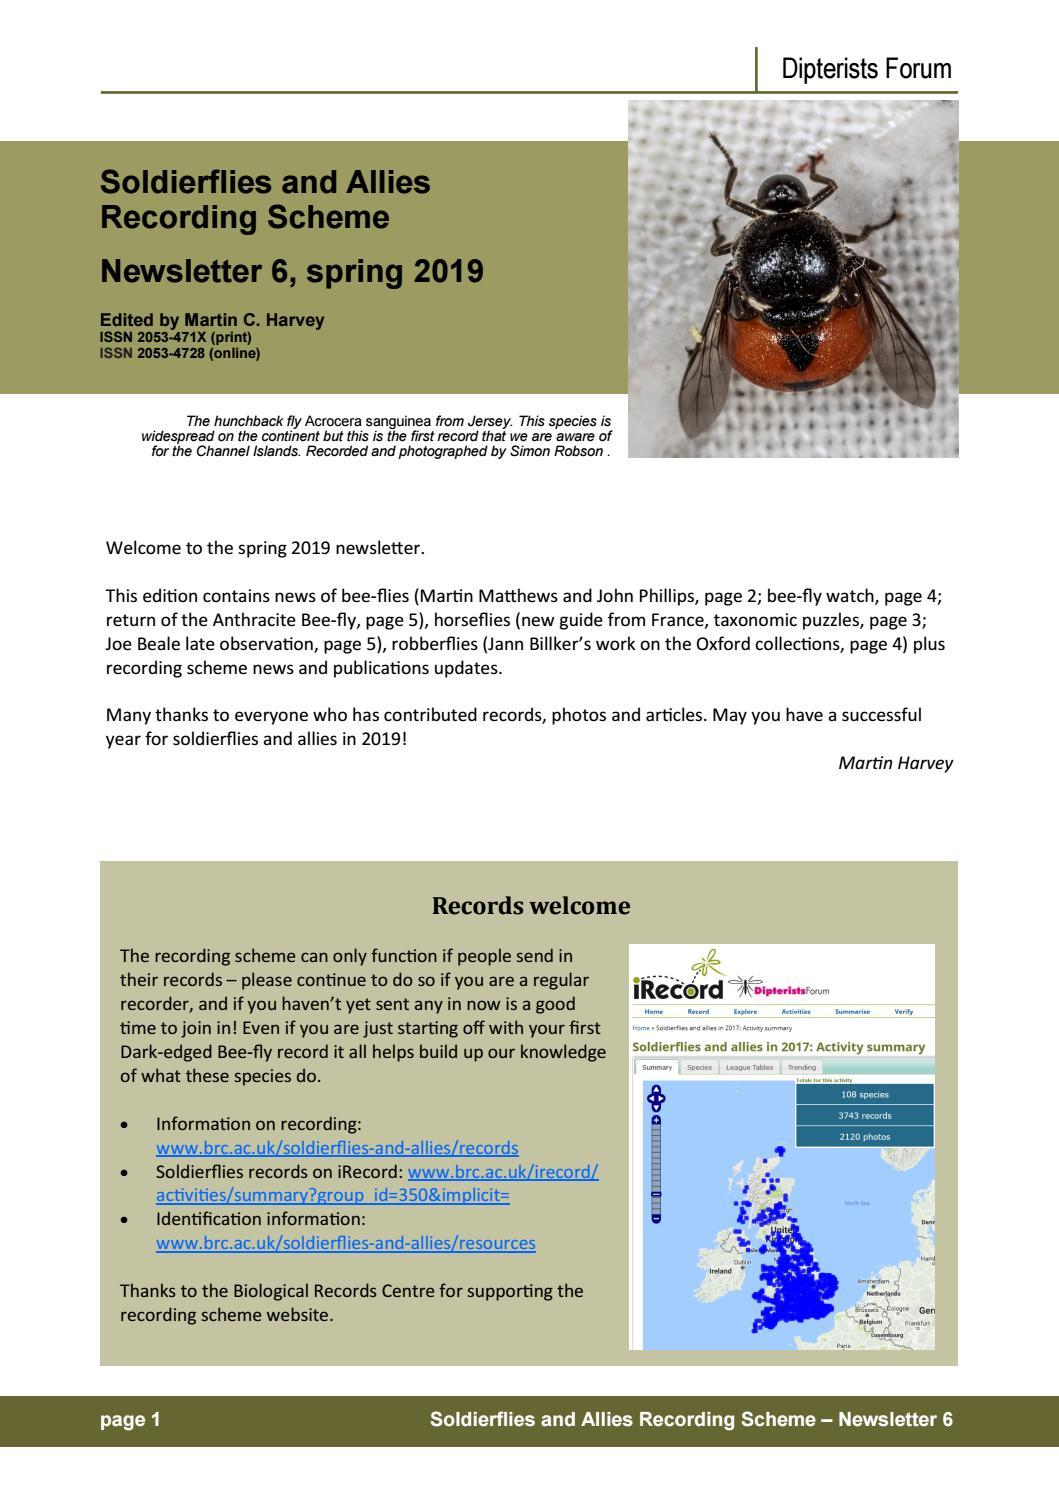 Soldierflies newsletter 6 by Martin Harvey - issuu